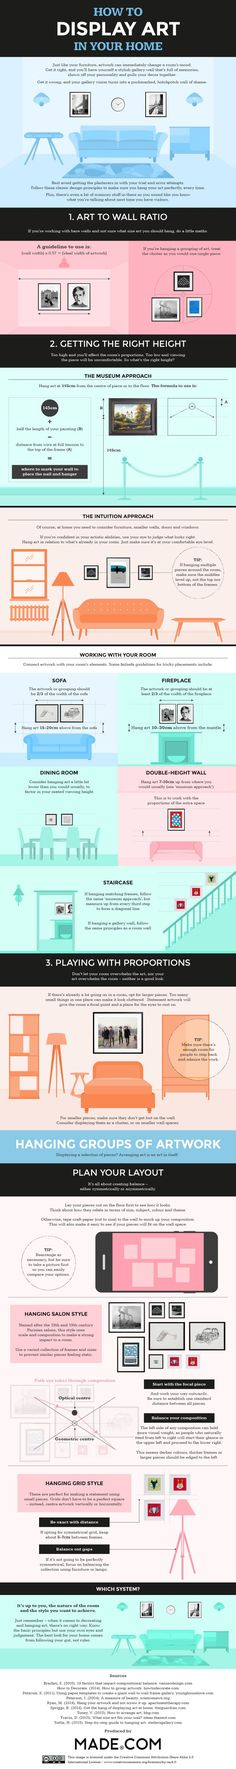 The Basics of Art Display